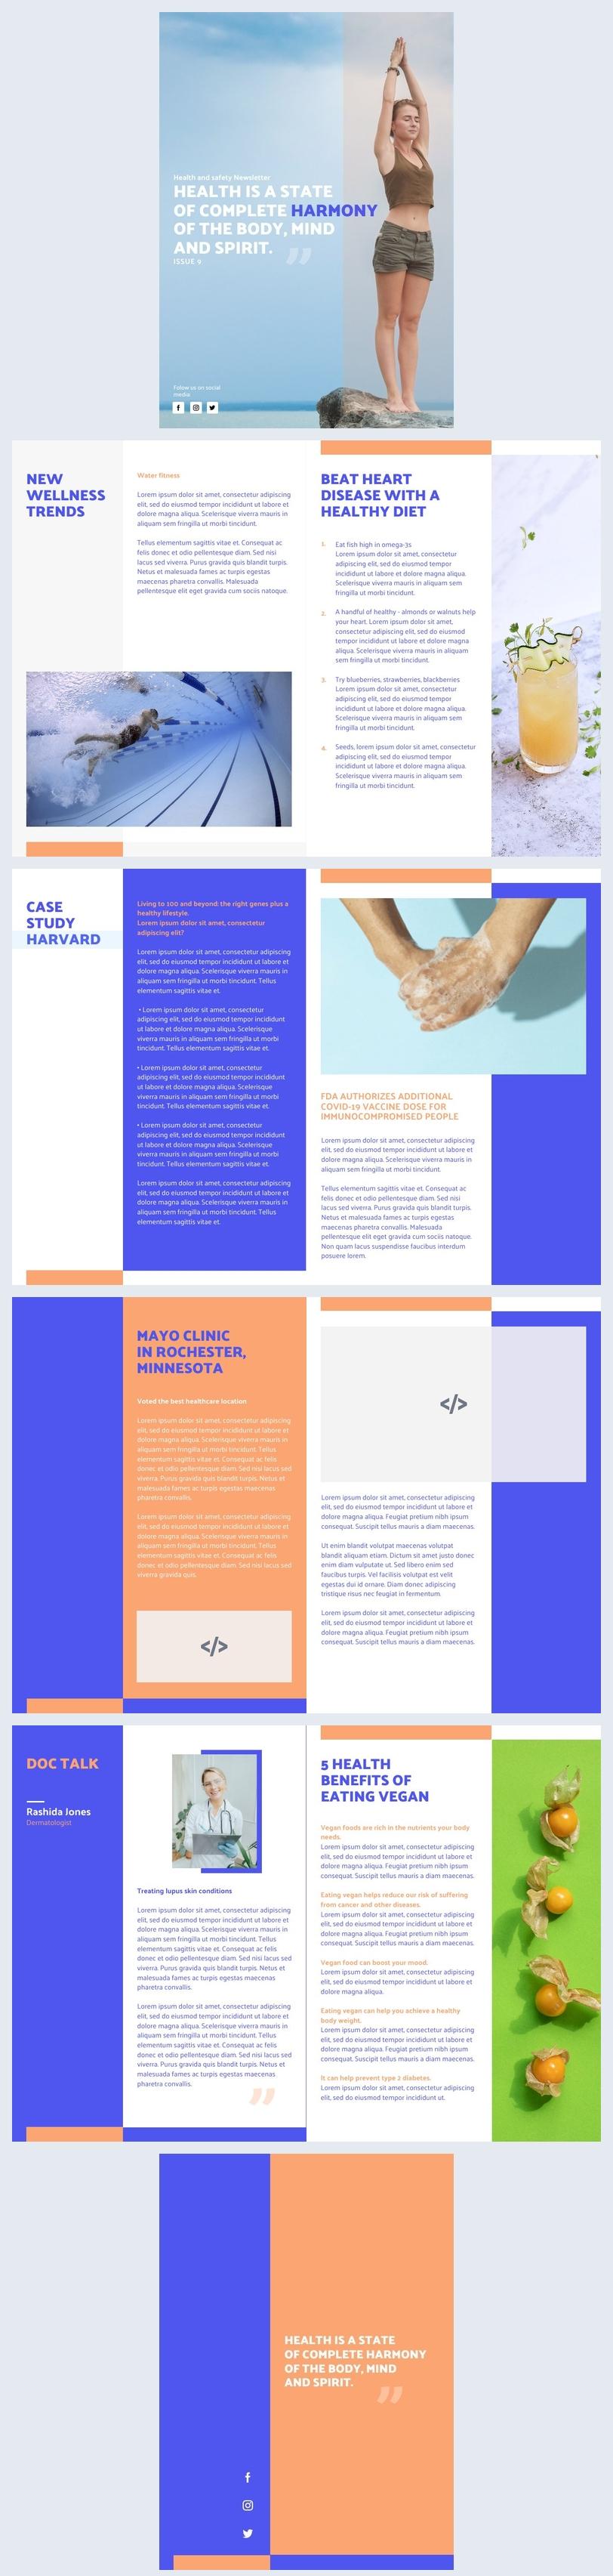 Exemplo de Design de Newsletter Interativa de Saúde